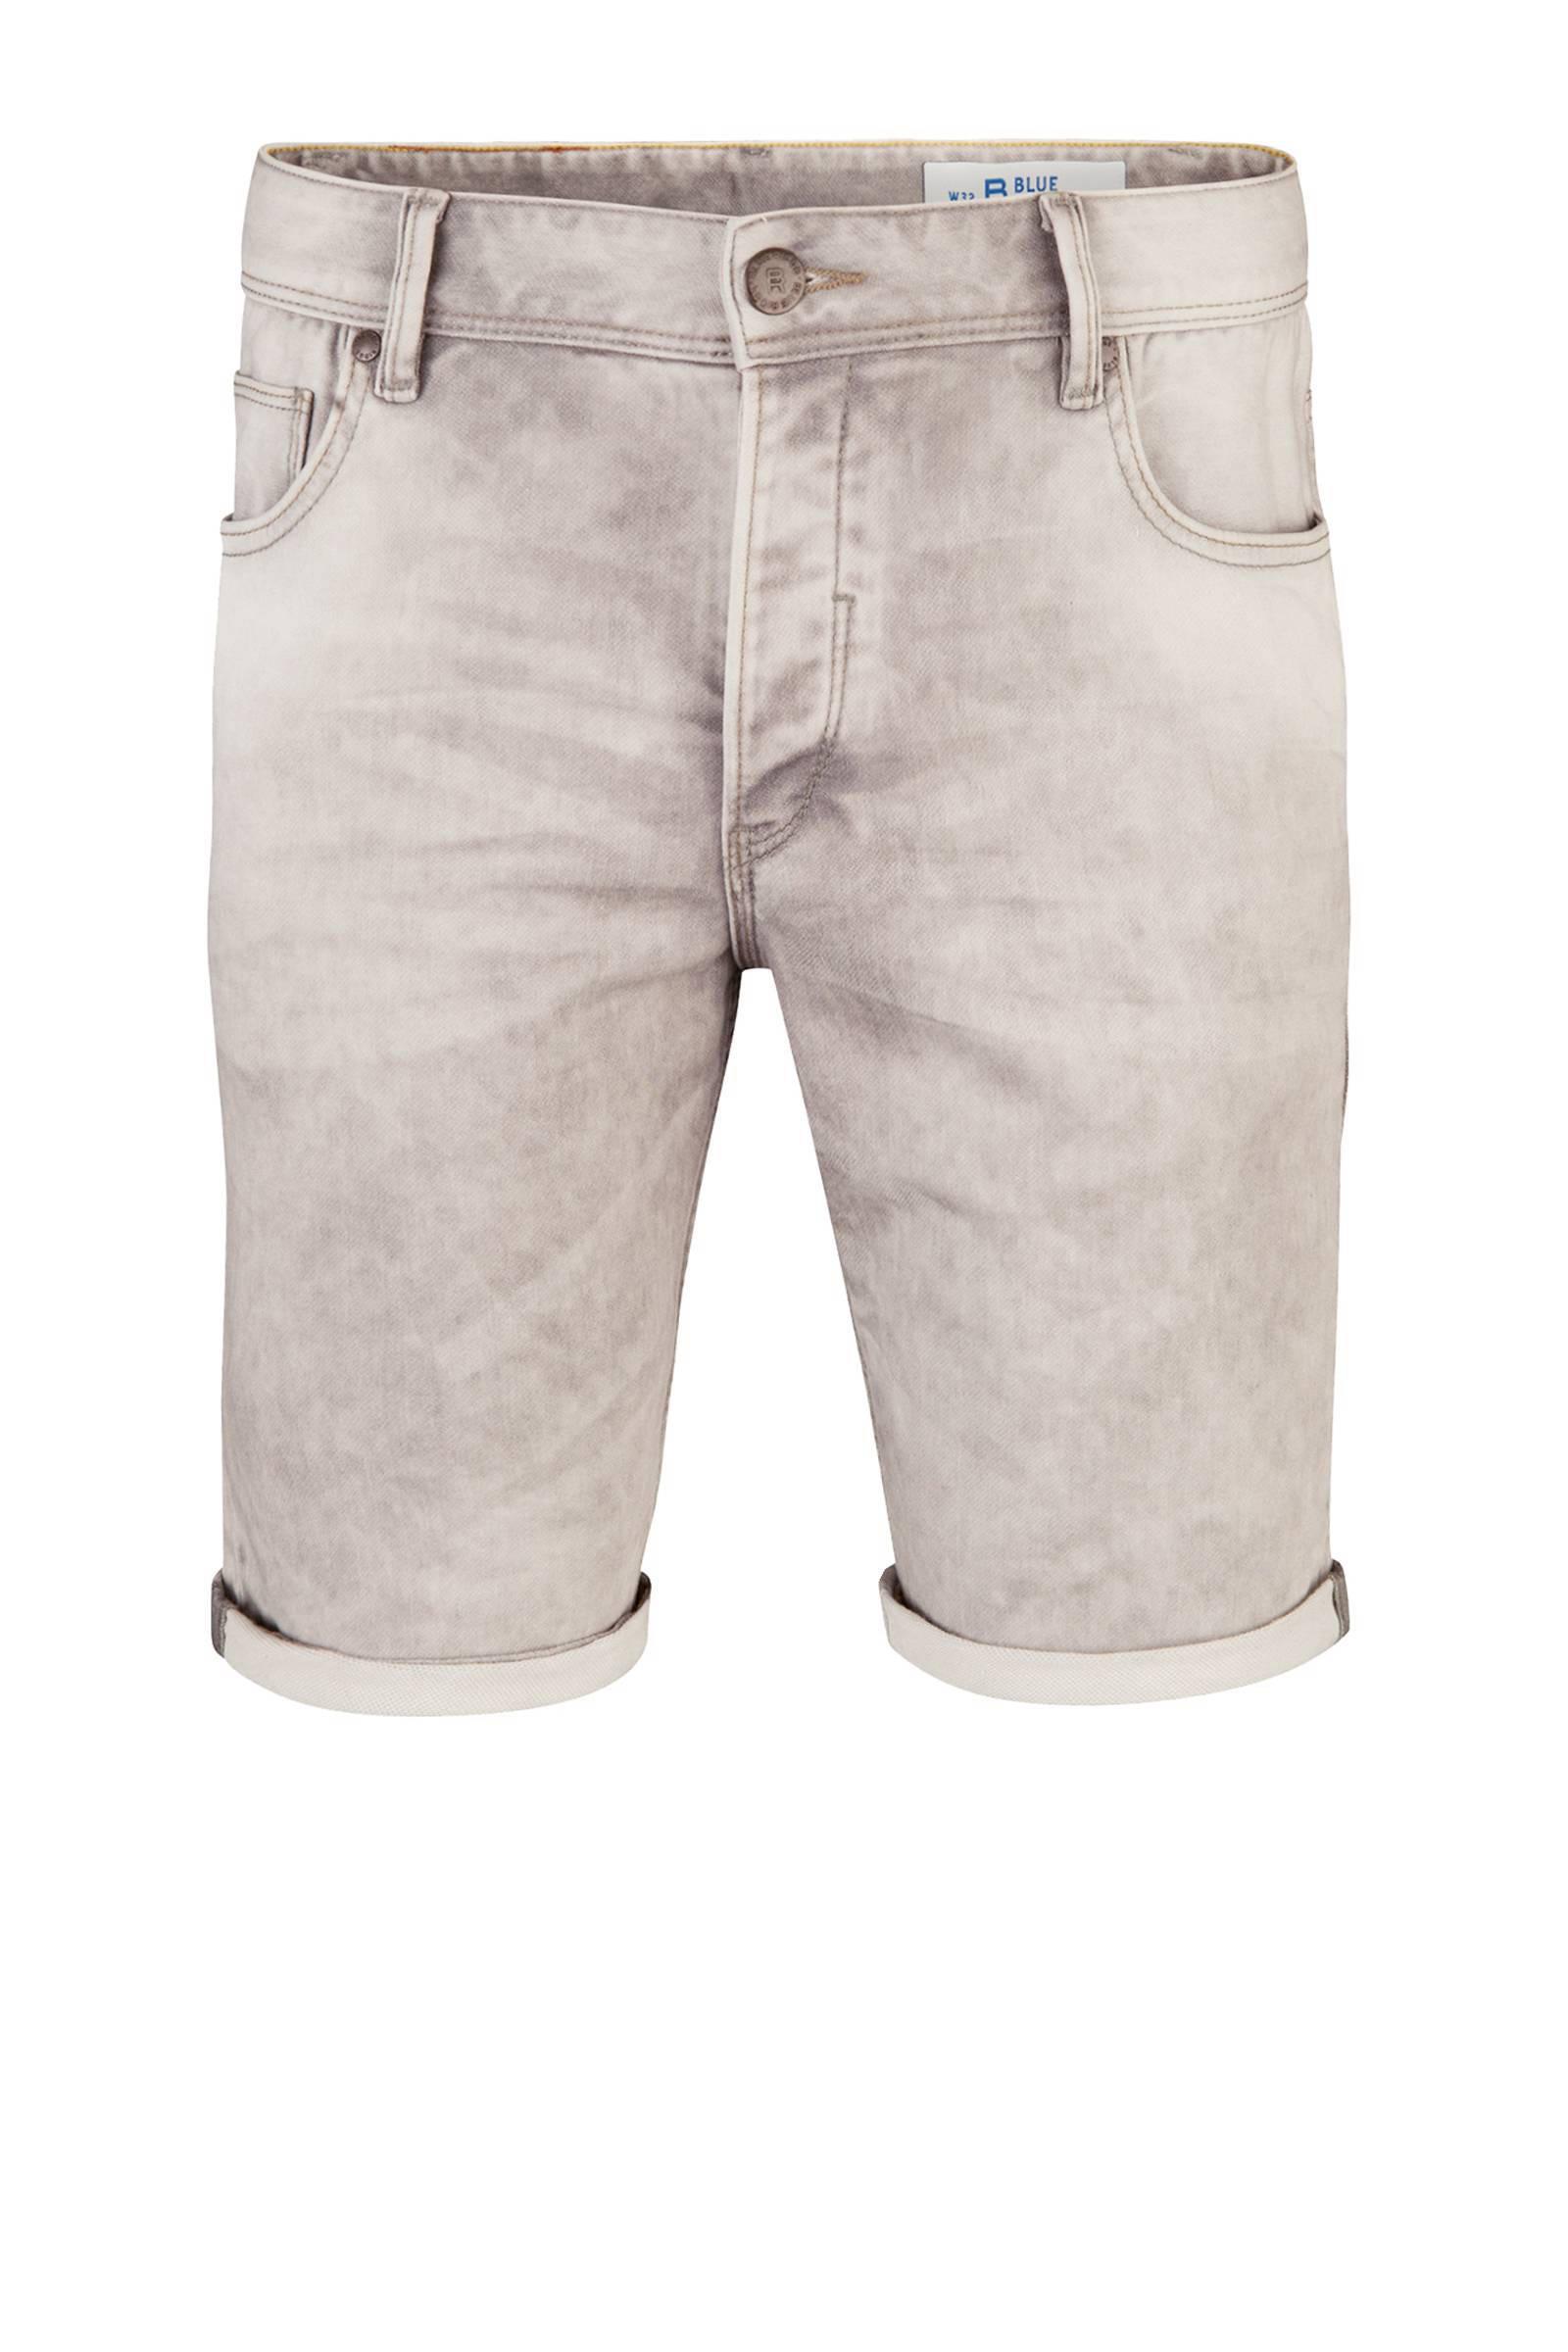 Korte Broek Heren We.We Fashion Blue Ridge Jog Denim Short Wehkamp